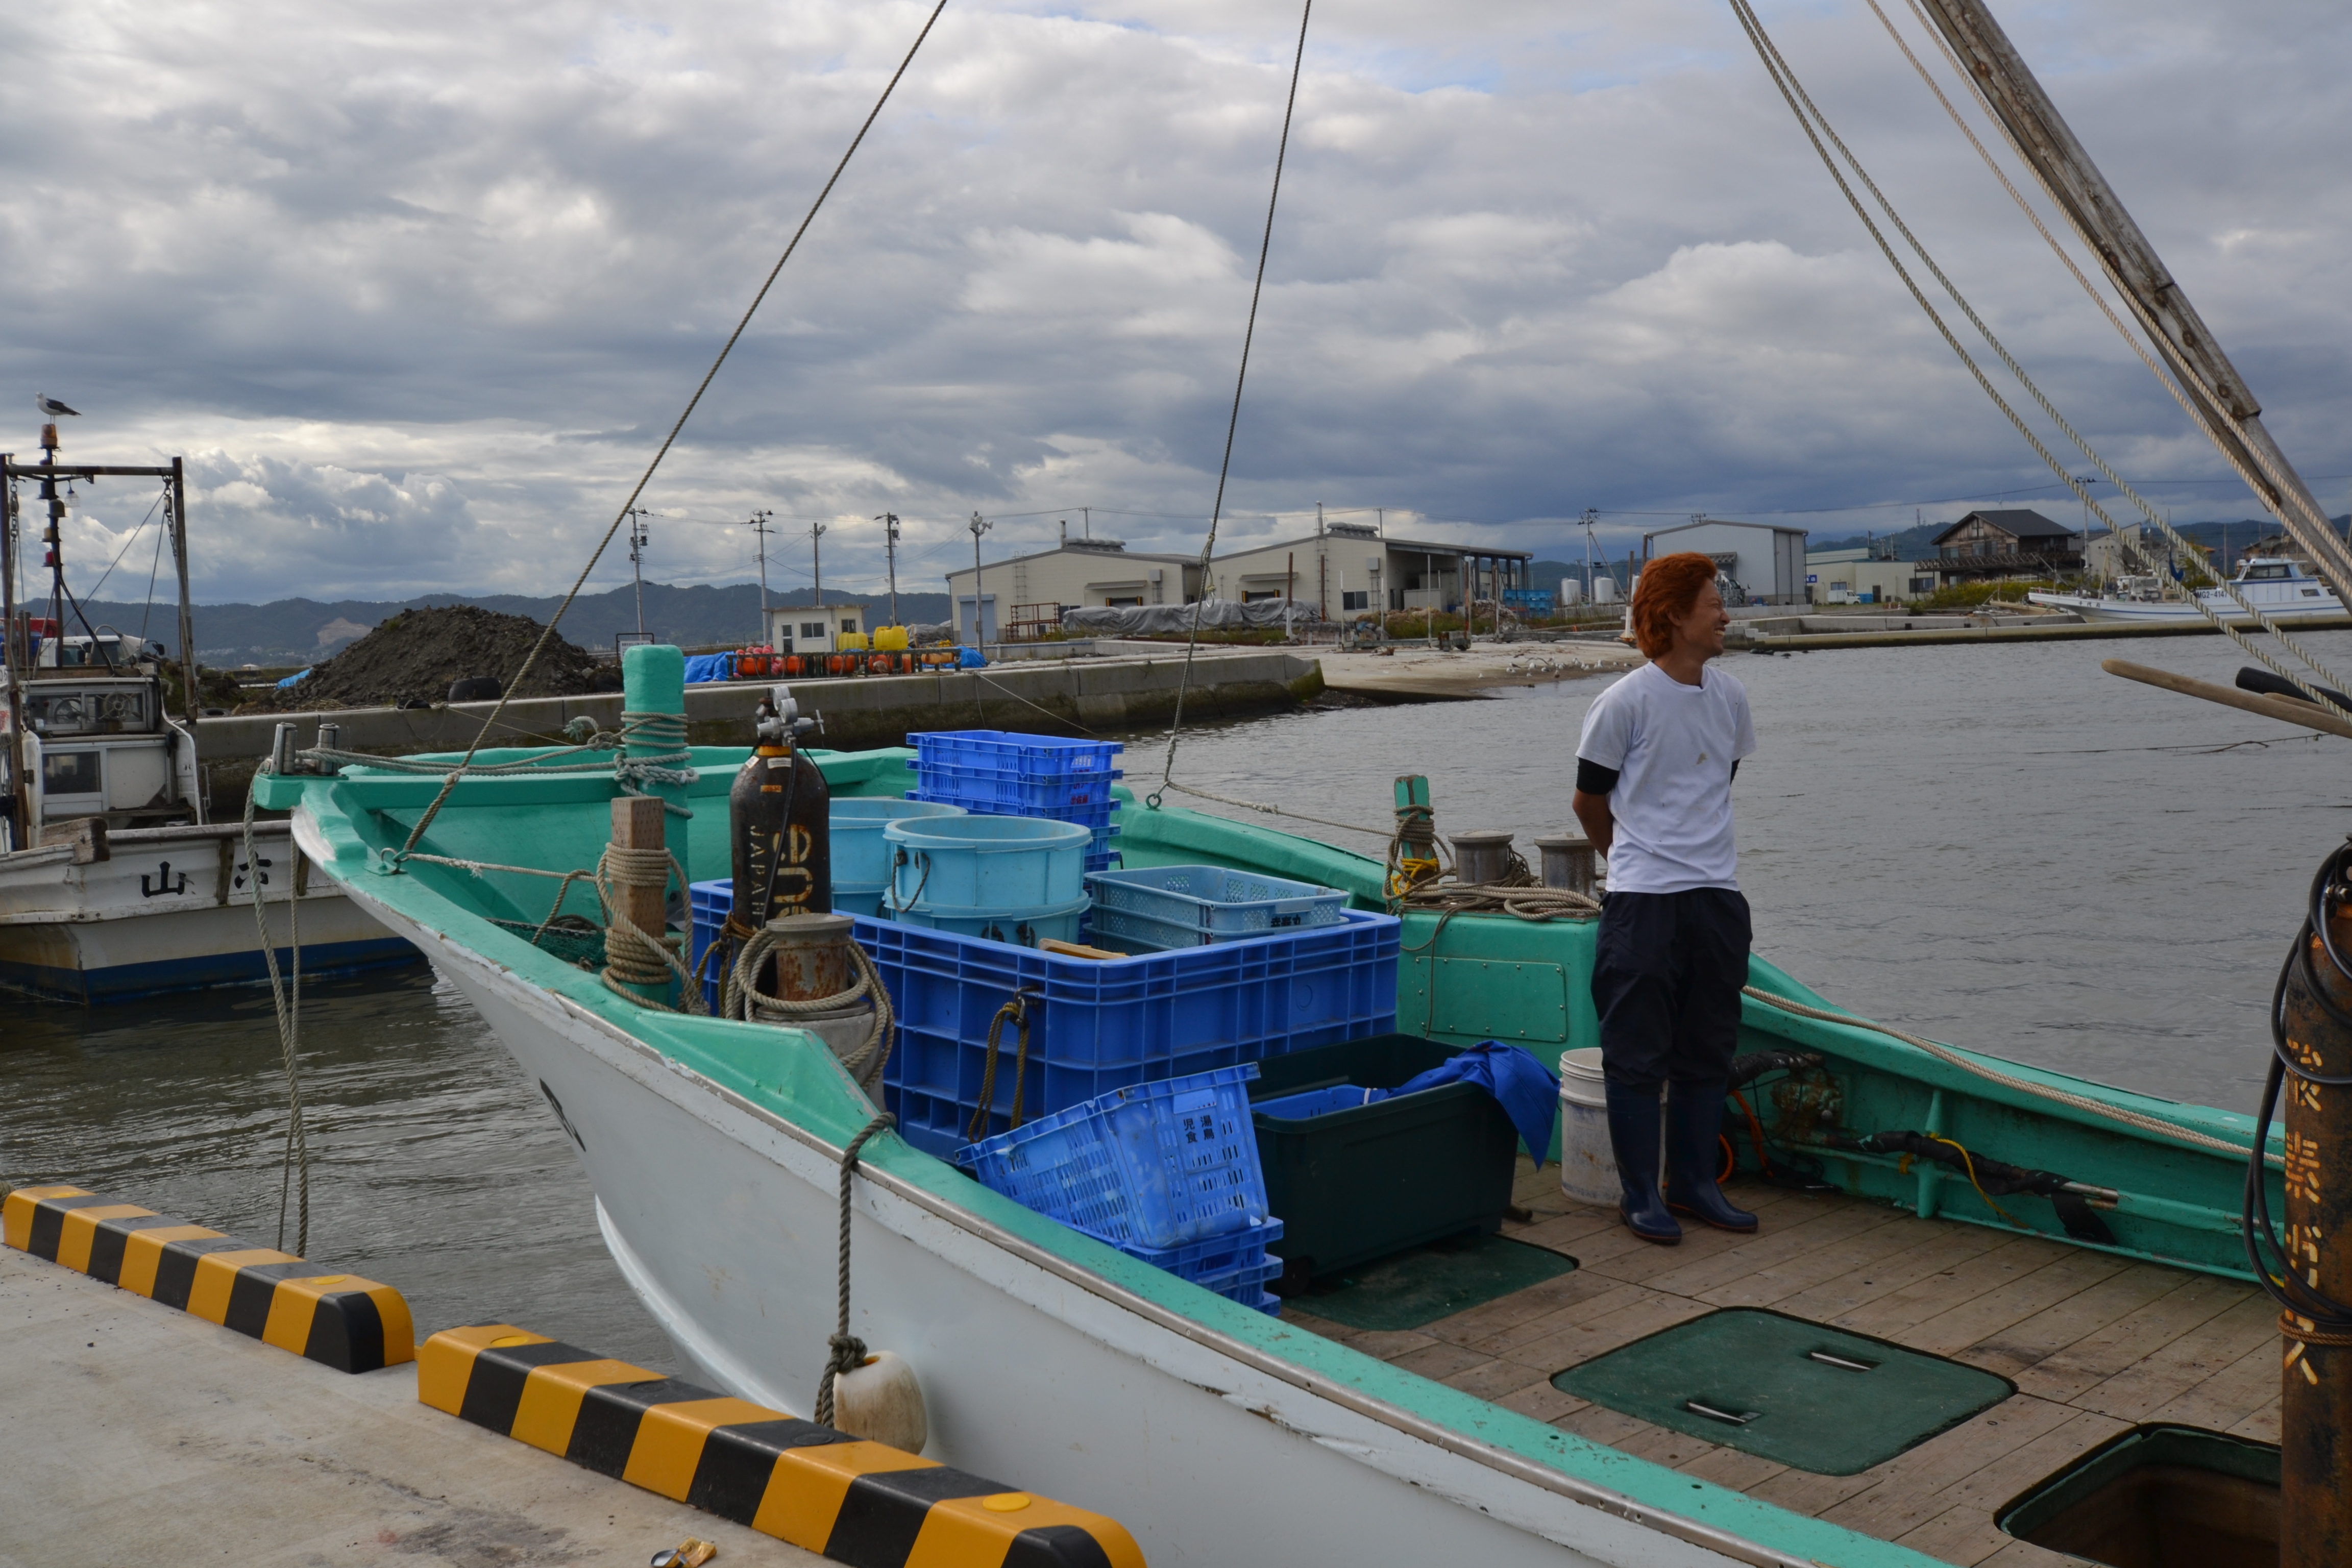 watari young mori fisherman on boat in harbor.JPG